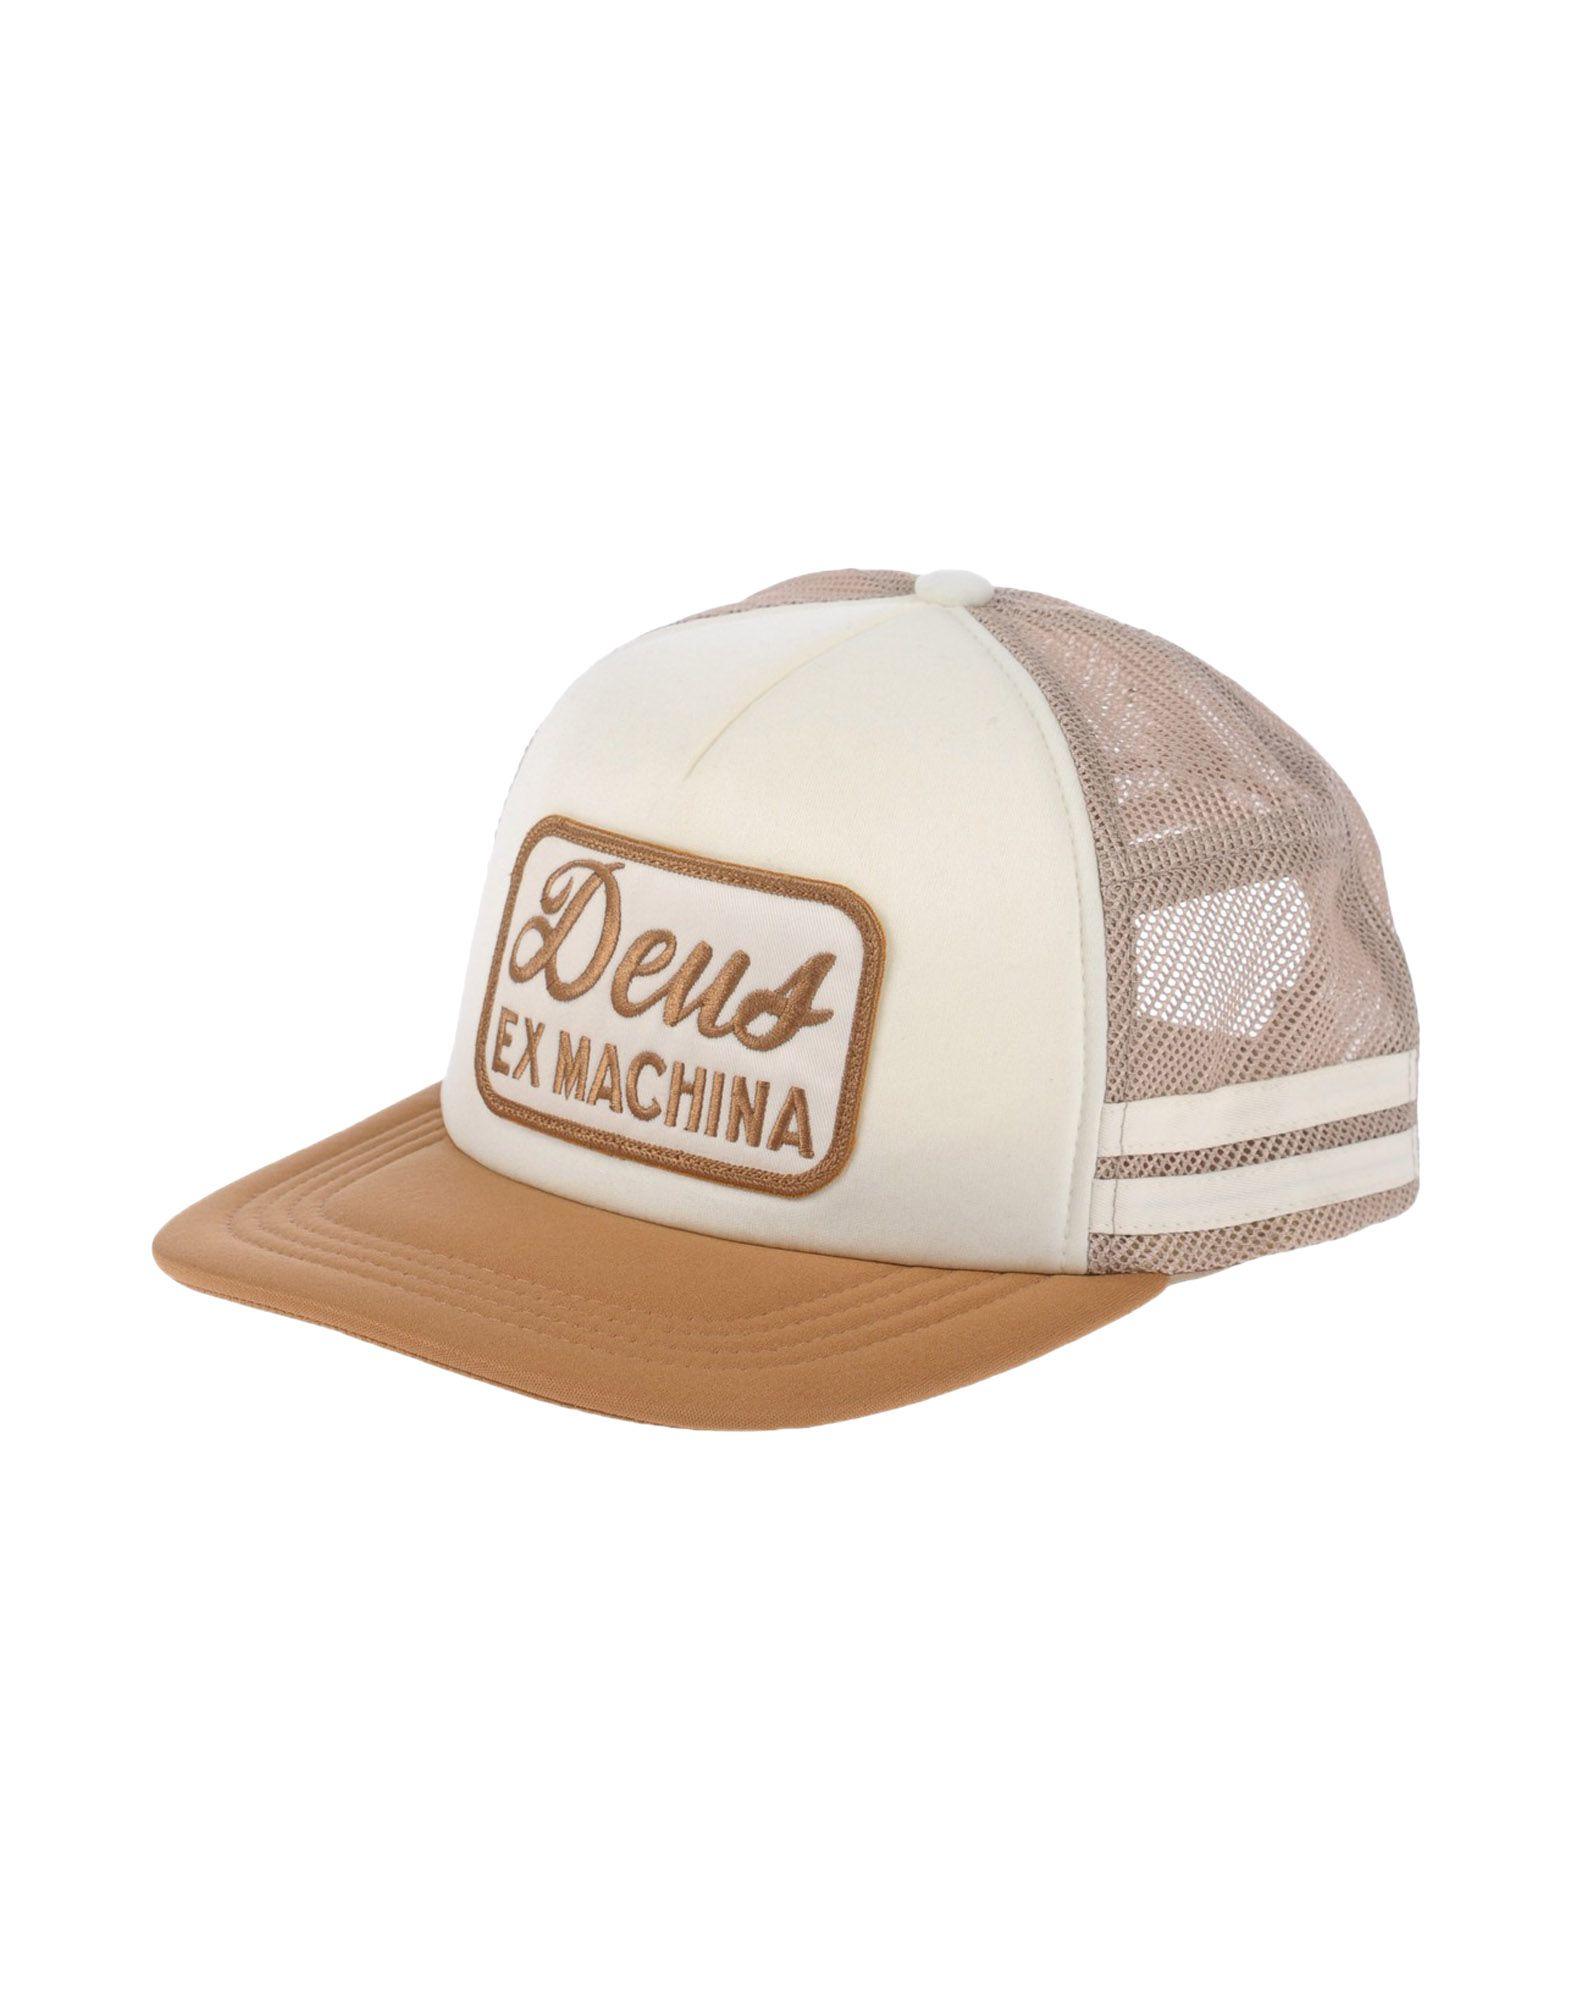 deus ex machina hat in white for men lyst. Black Bedroom Furniture Sets. Home Design Ideas